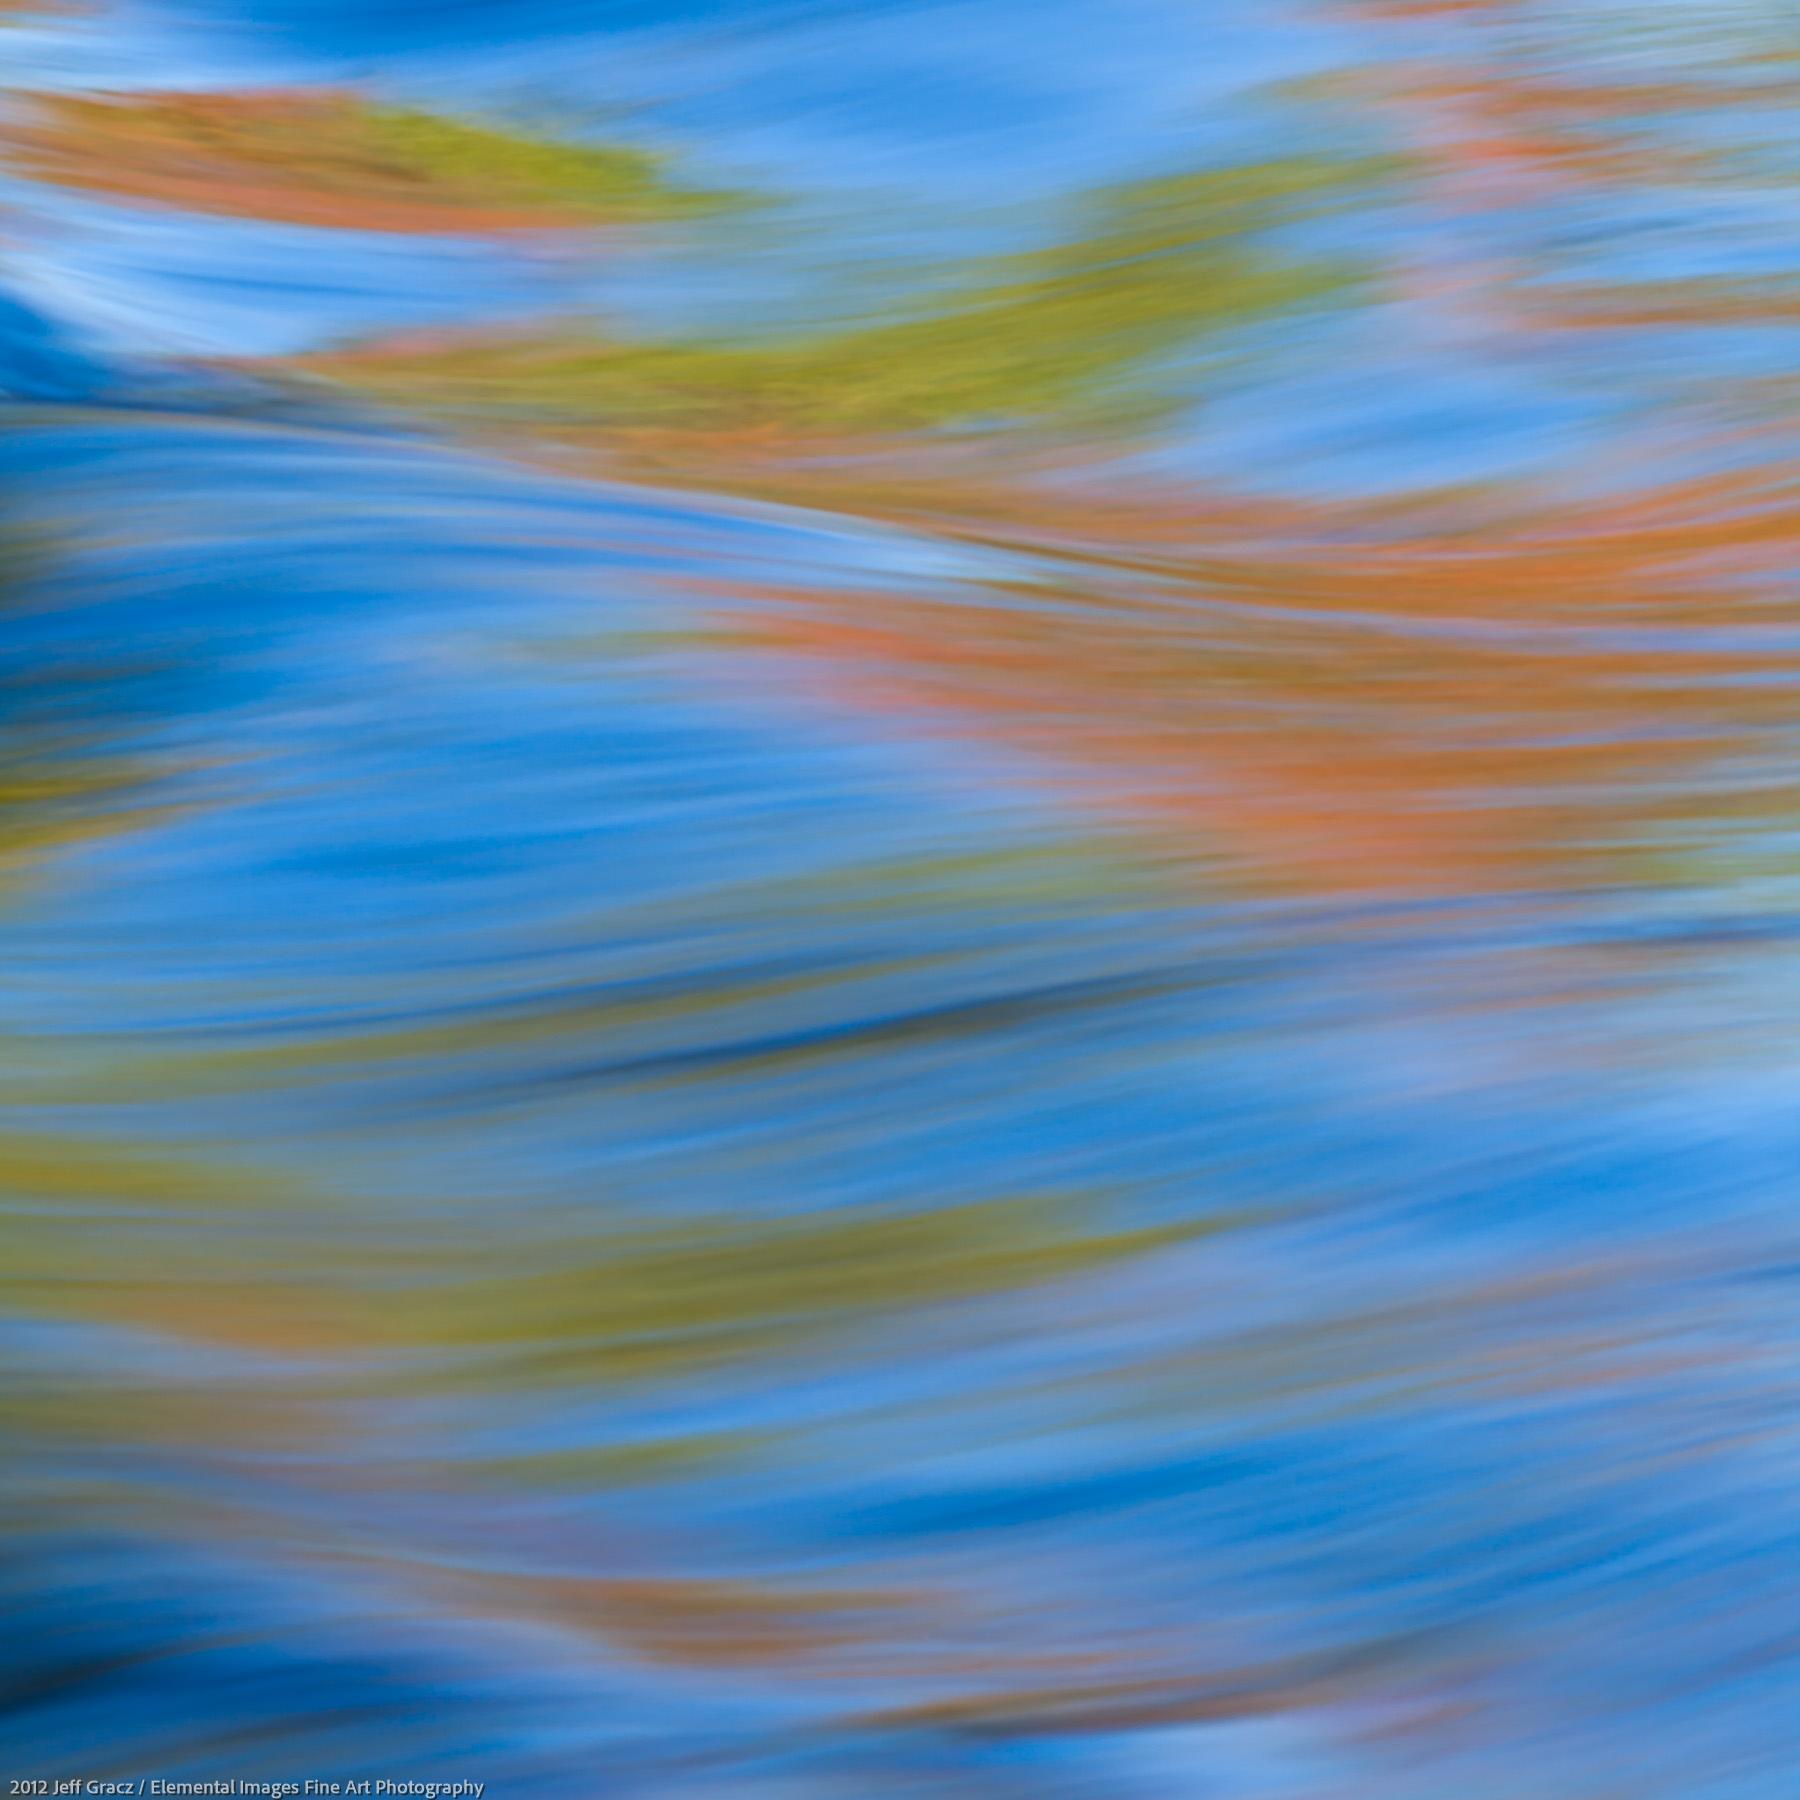 Water Pattern VIII | Kejimkujik National Park | Nova Scotia | Canada - © 2012 Jeff Gracz / Elemental Images Fine Art Photography - All Rights Reserved Worldwide